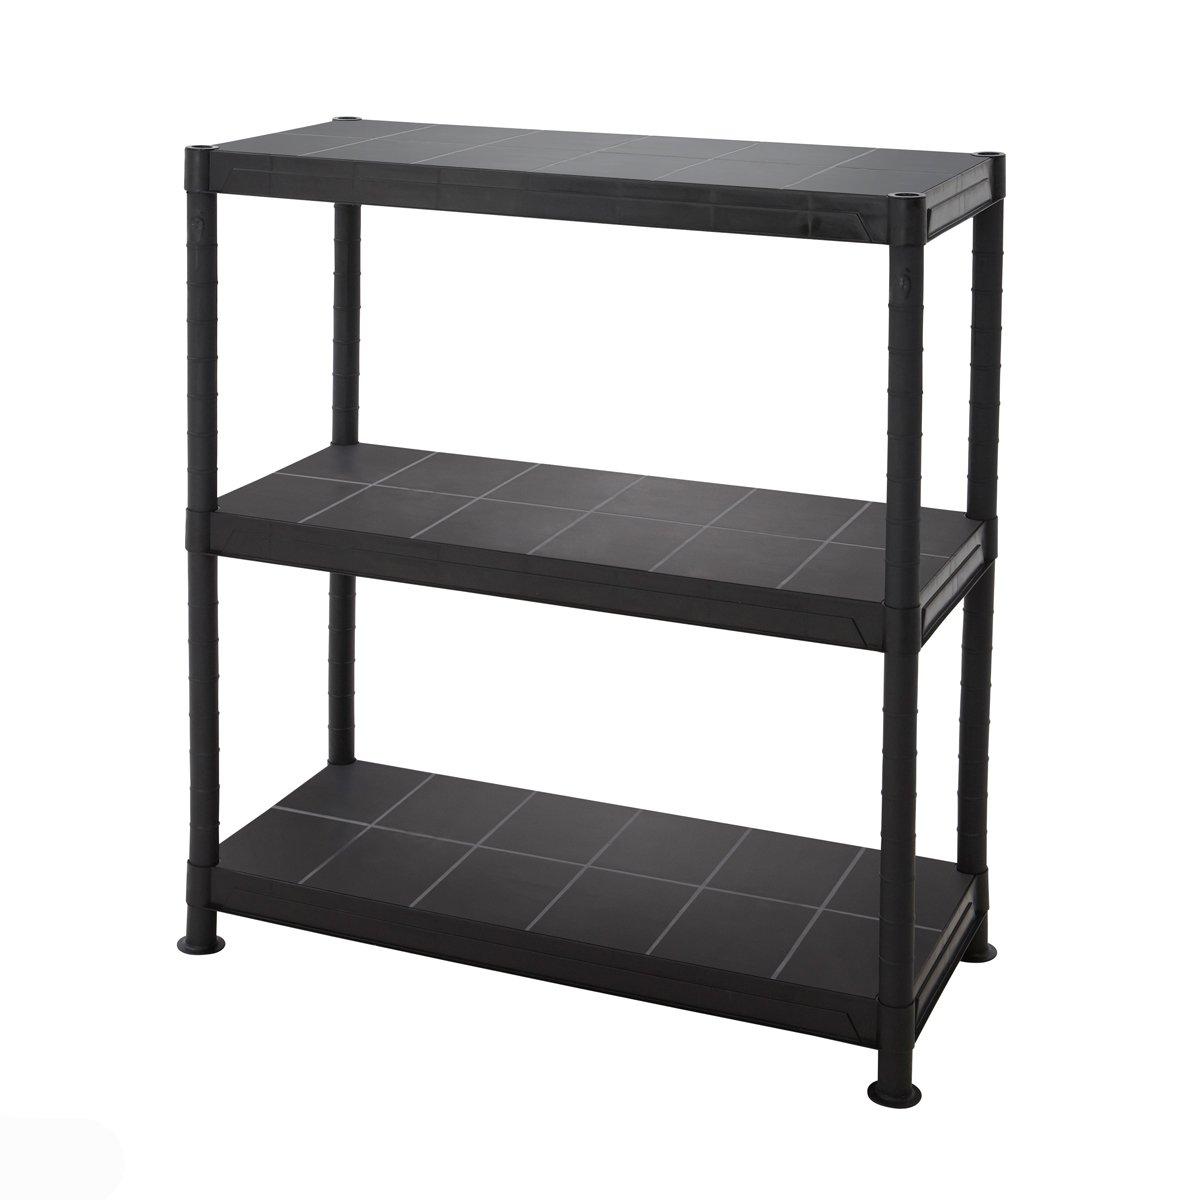 Tiered plastic garage shelving storage unit ventilated garden shelves 4 sizes available bigdug